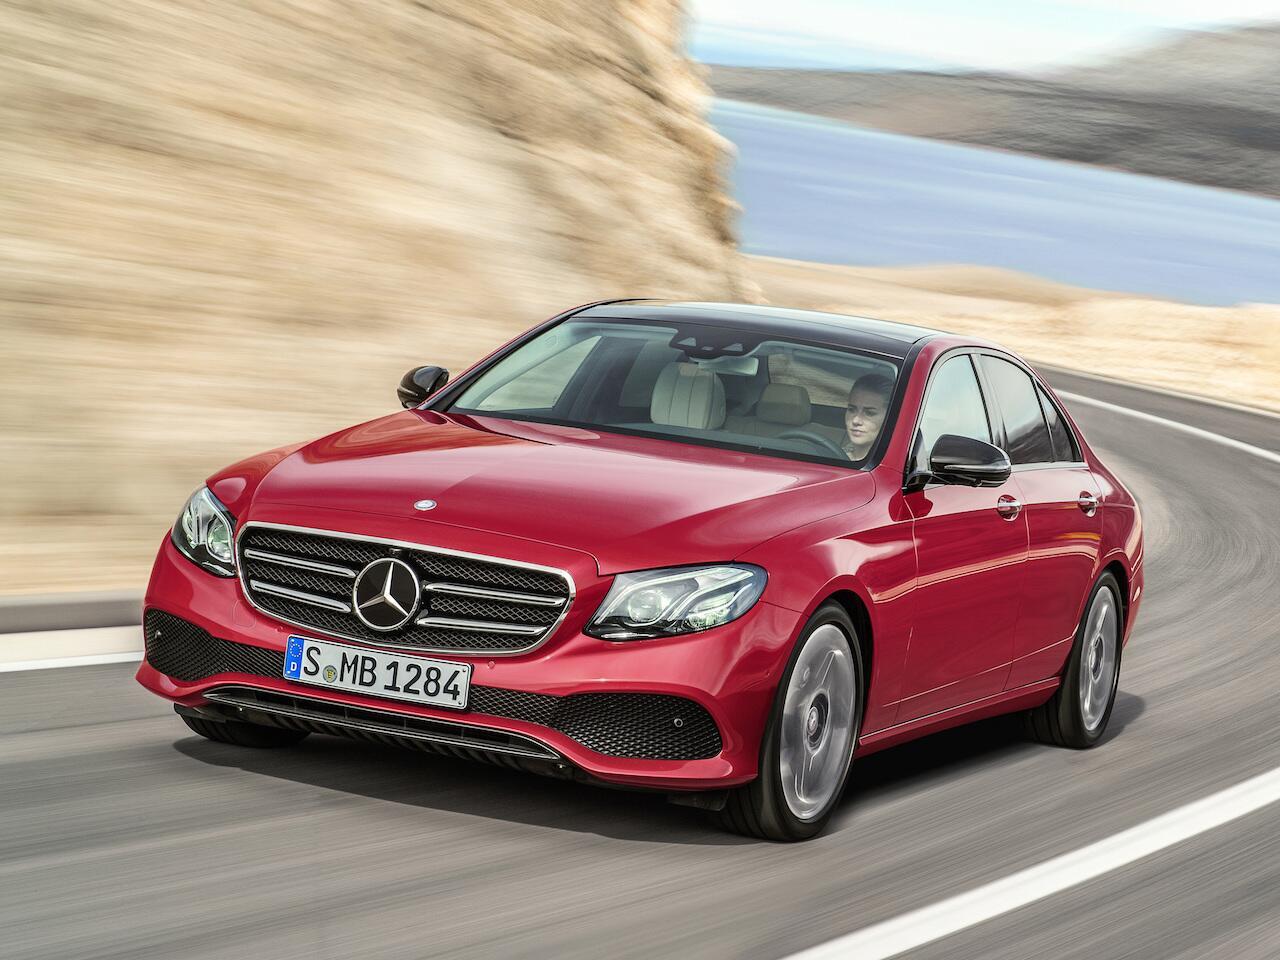 Bild zu Obere Mittelklasse: Mercedes-Benz E-Klasse